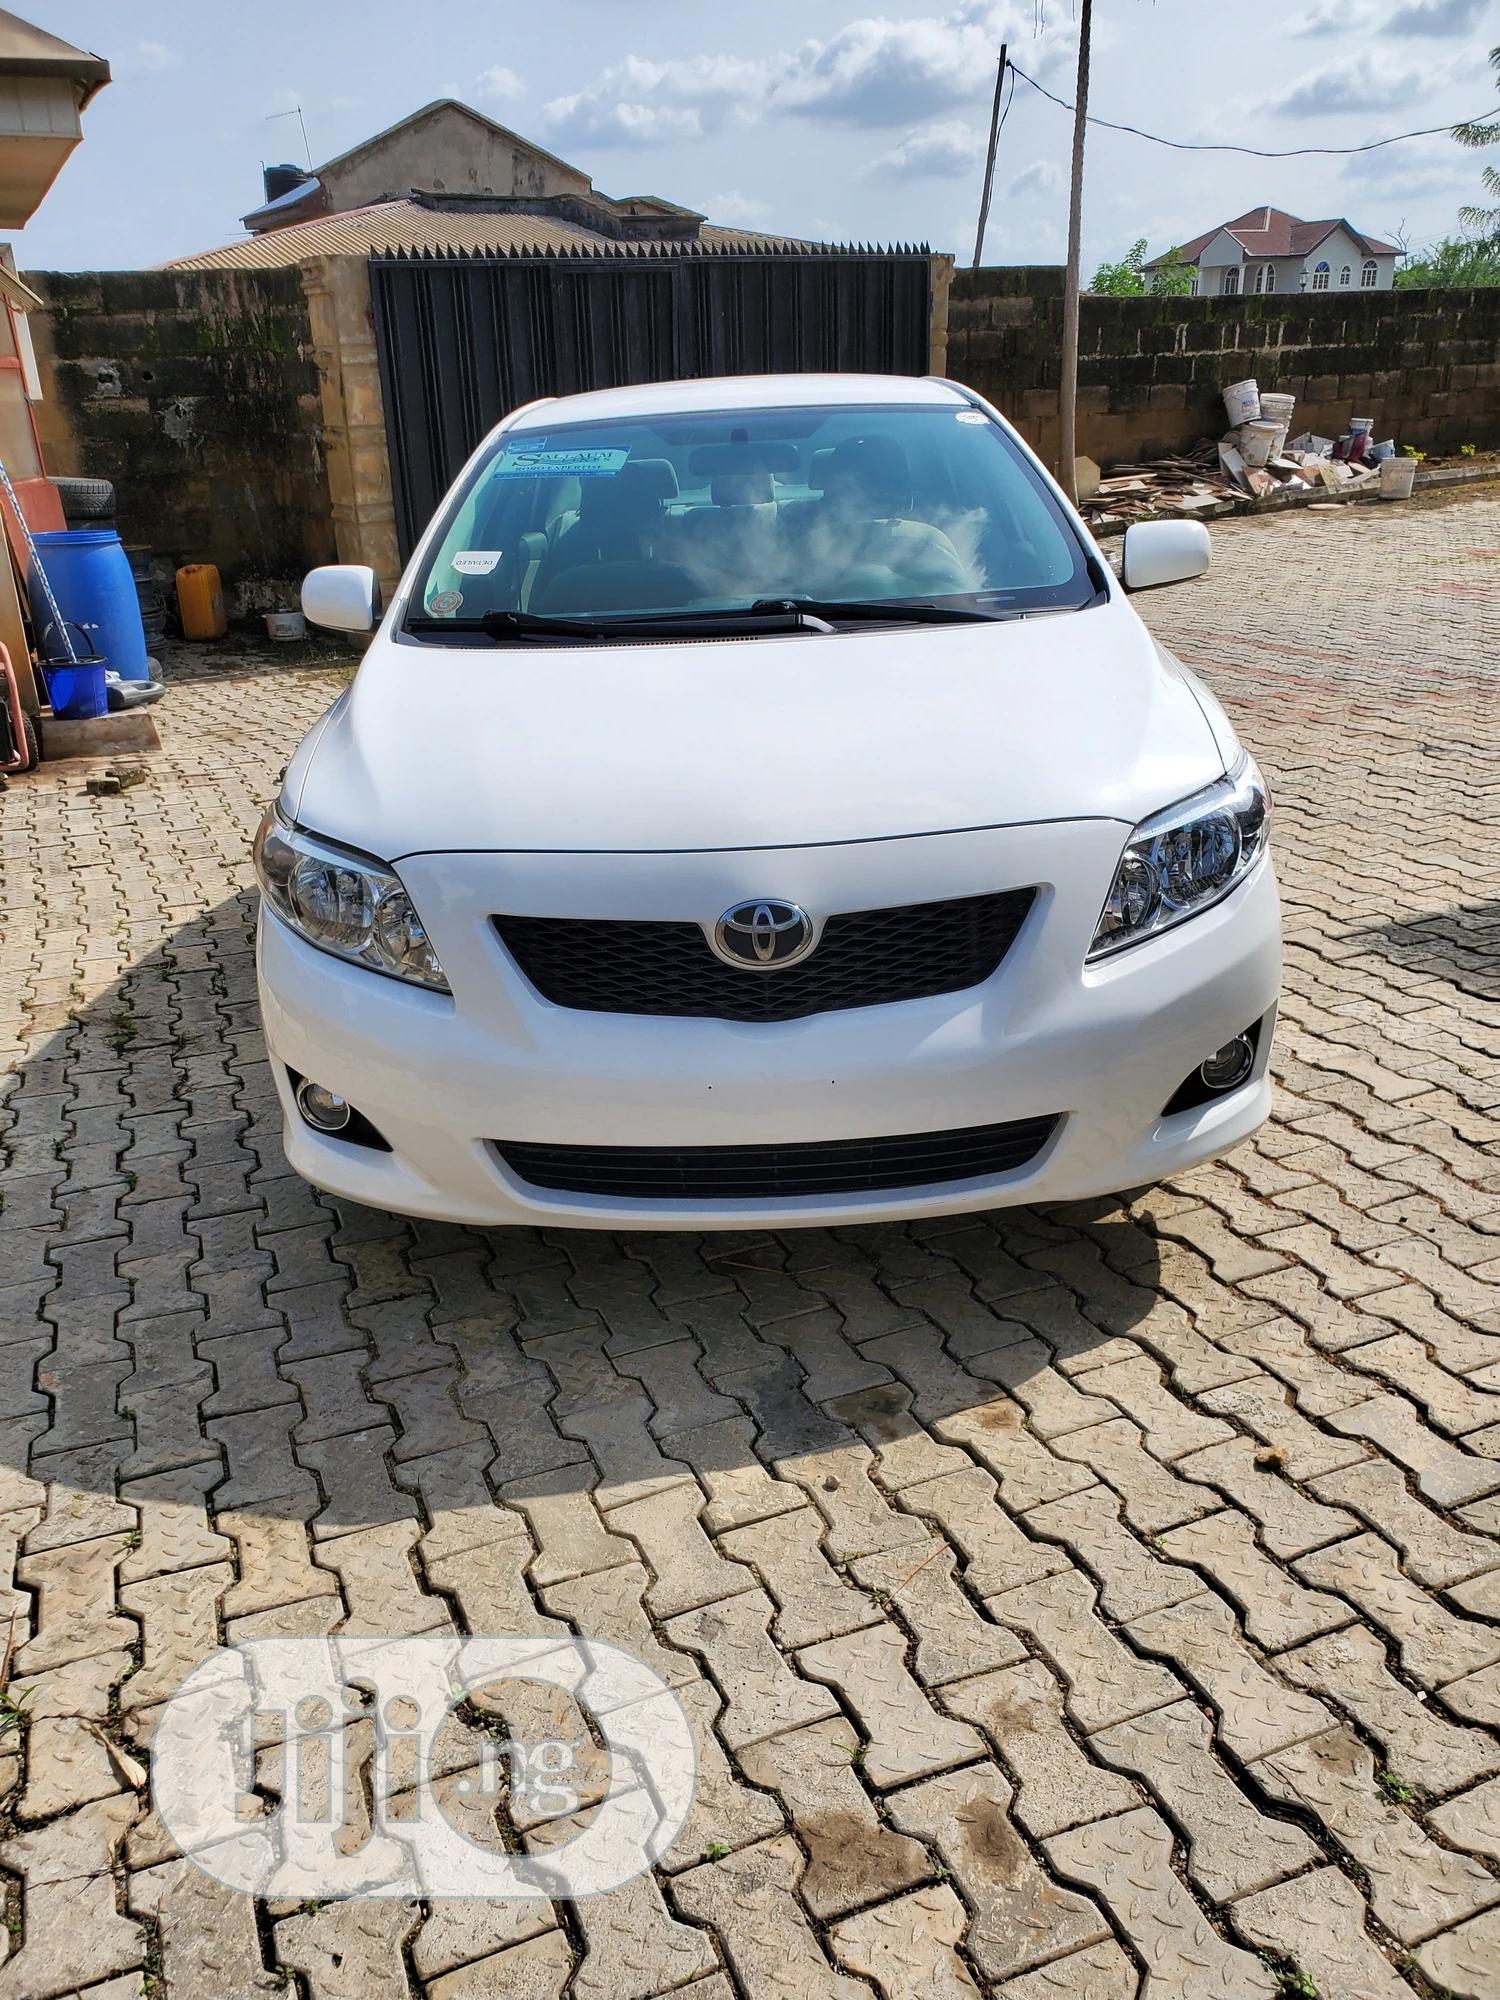 Toyota Corolla 2009 White In Oluyole Cars Adedayo Awoyemi Jiji Ng For Sale In Oluyole Buy Cars From Adedayo Awoyemi On Jiji Ng